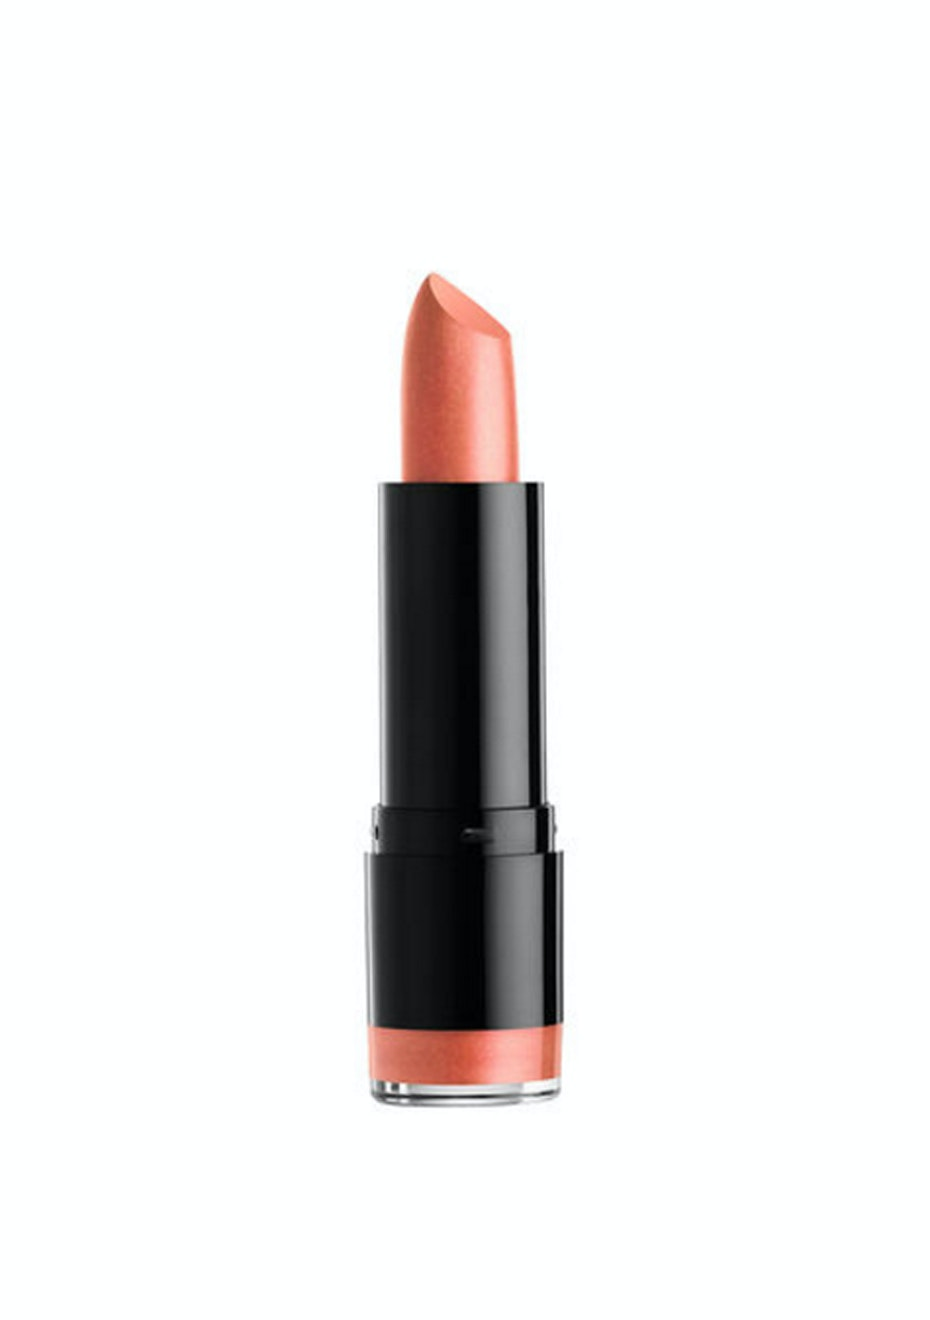 NYX Extra Creamy Round Lipstick - LSS626 Vitamin